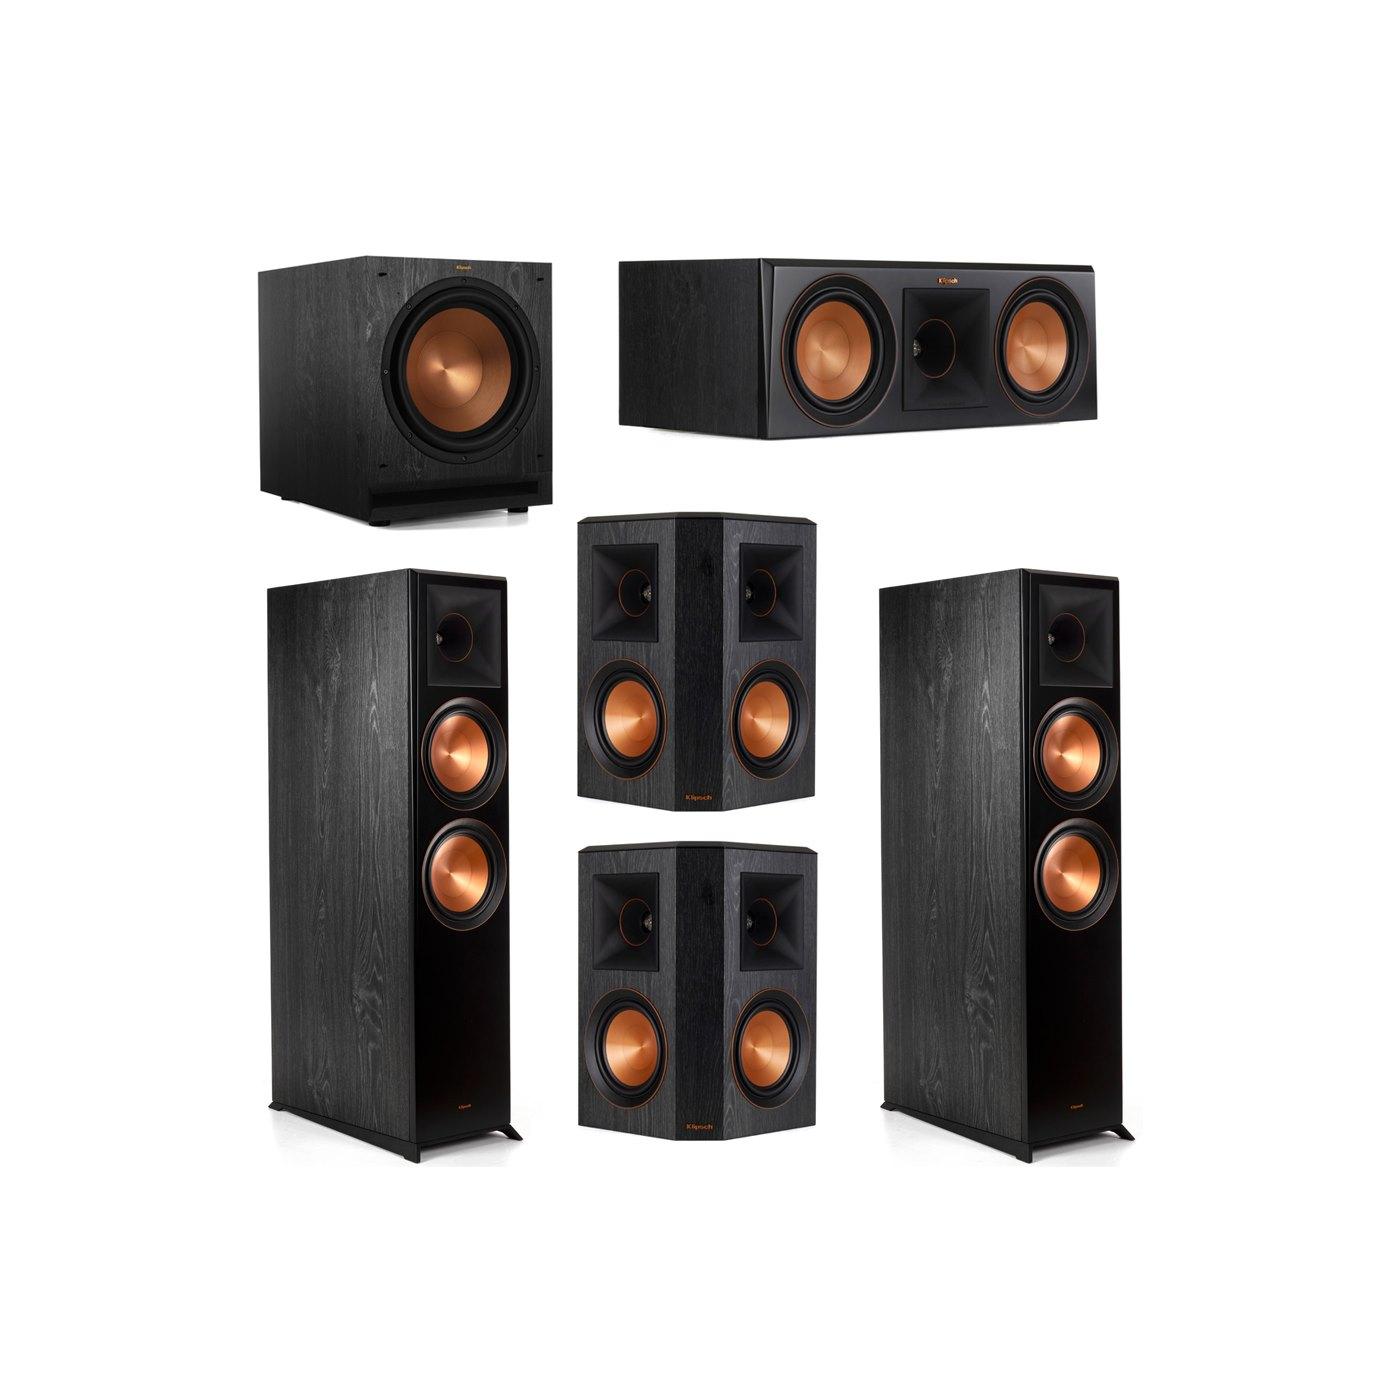 Klipsch 5.1 System with 2 RP-8000F Floorstanding Speakers, 1 Klipsch RP-600C Center Speaker, 2 Klipsch RP-502S Surround Speakers, 1 Klipsch SPL-120 Subwoofer